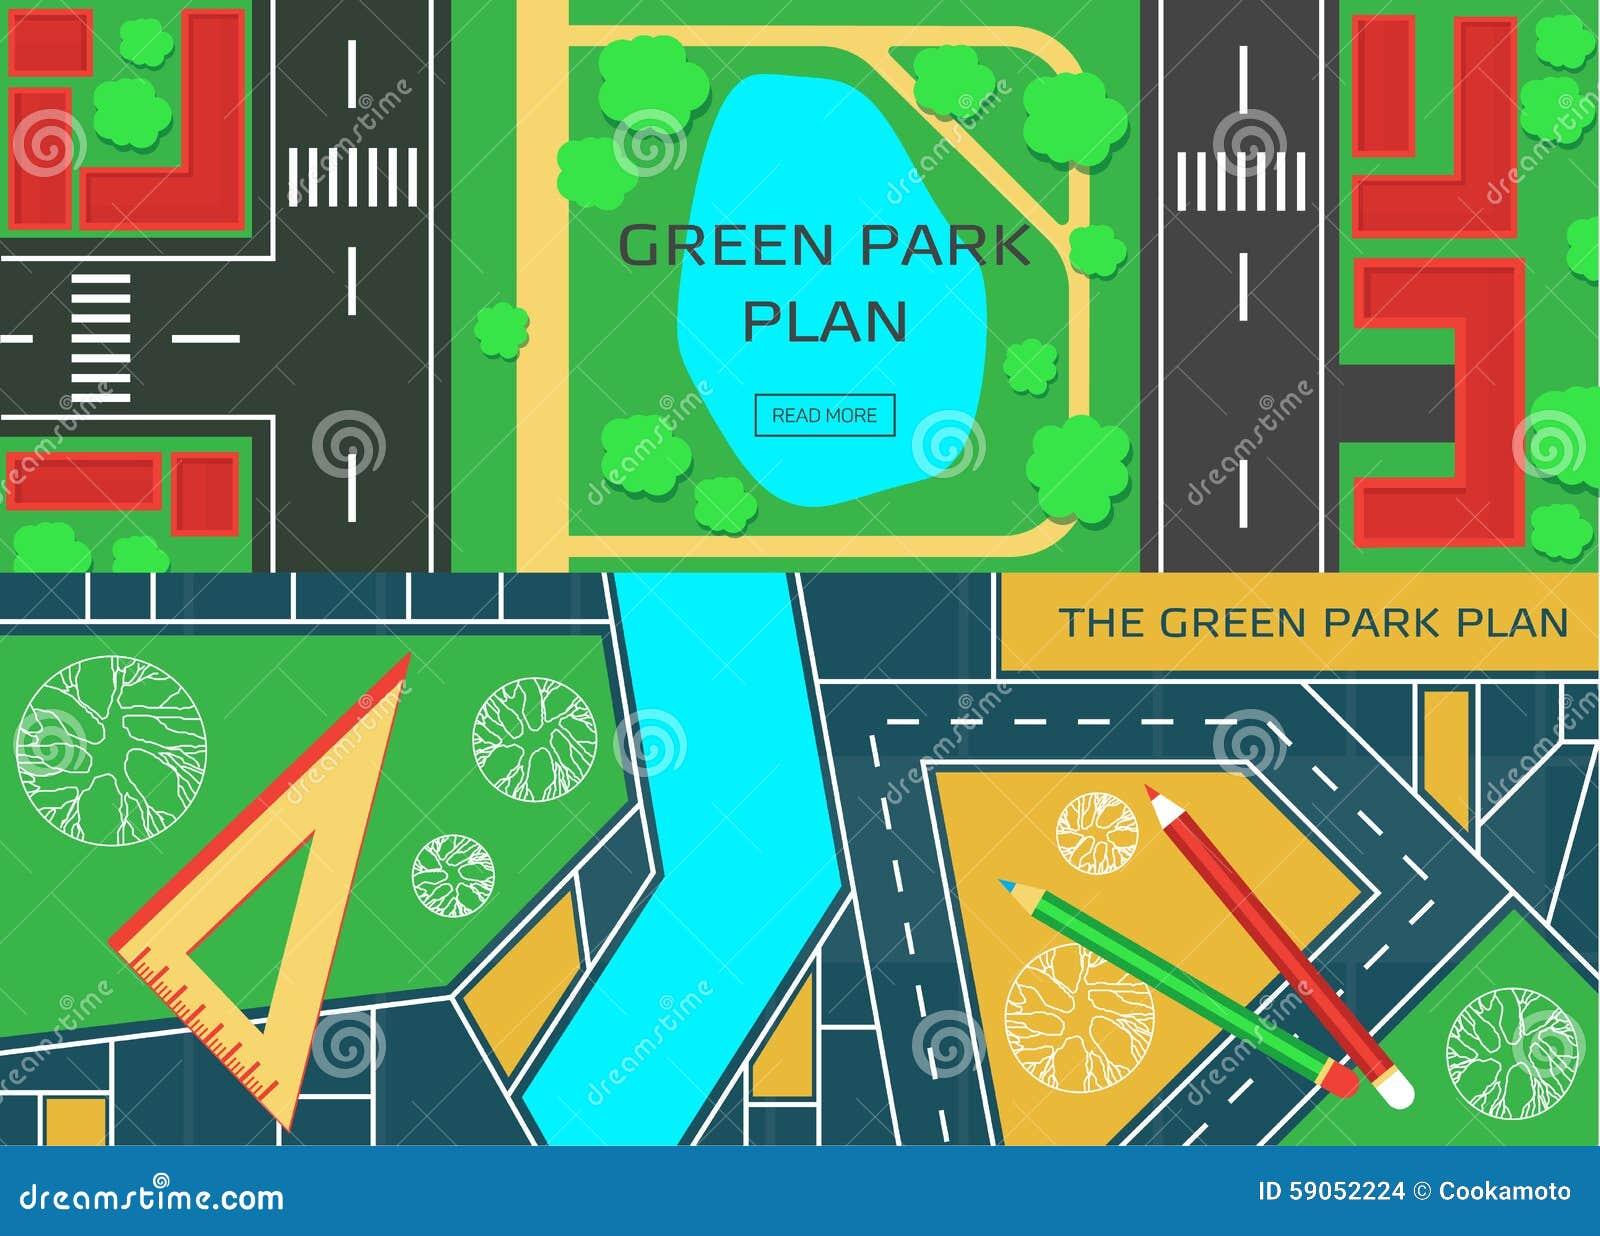 E poster design software - Online City Garden Creative Design Stock Images